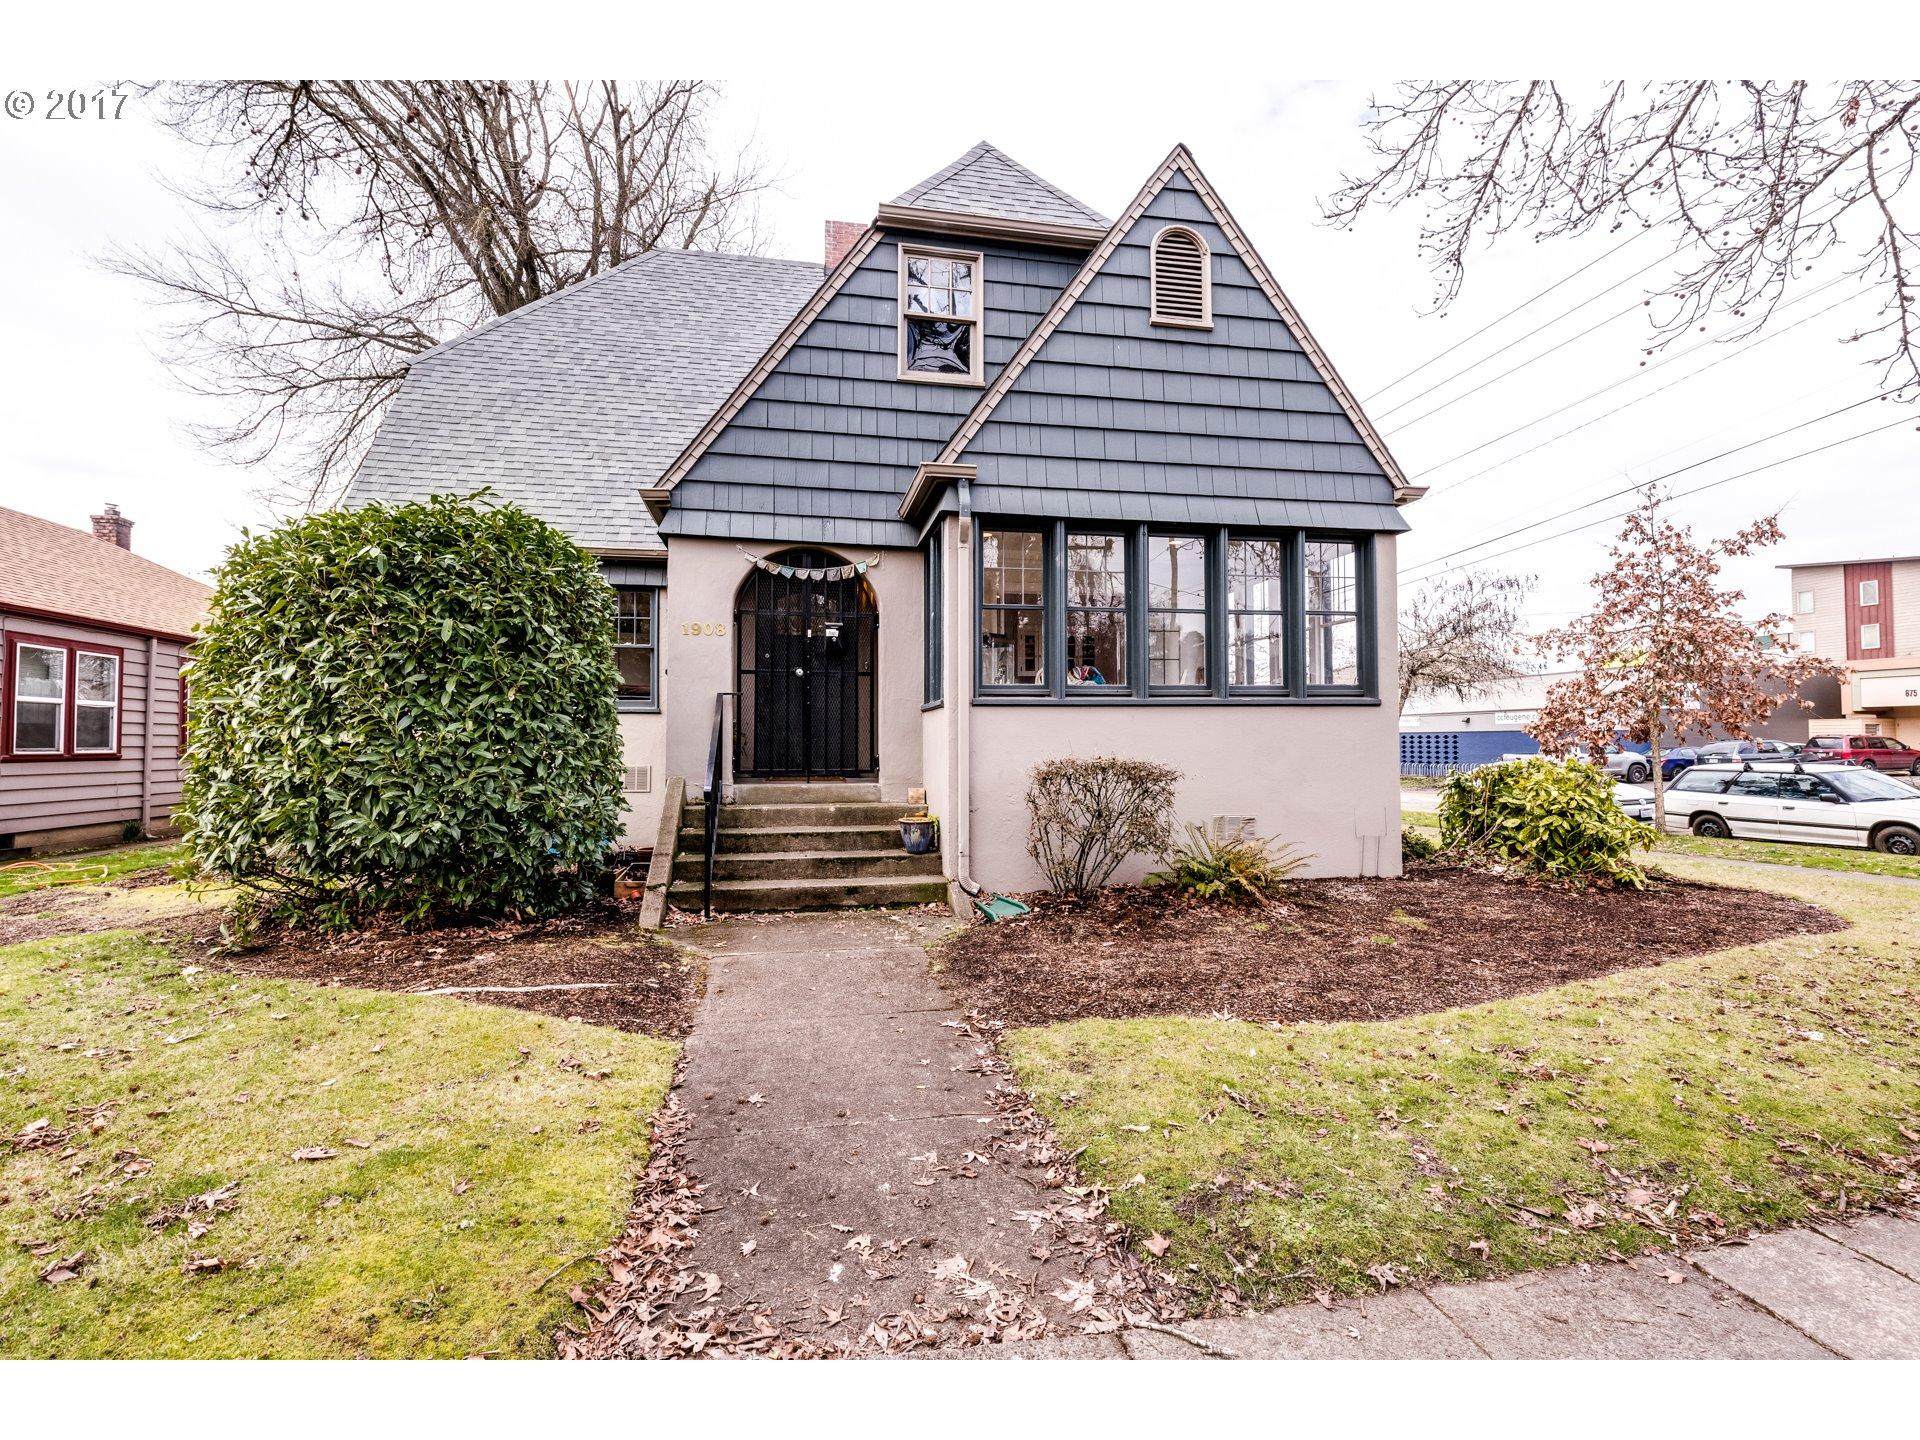 1908 HILYARD ST, Eugene OR 97405